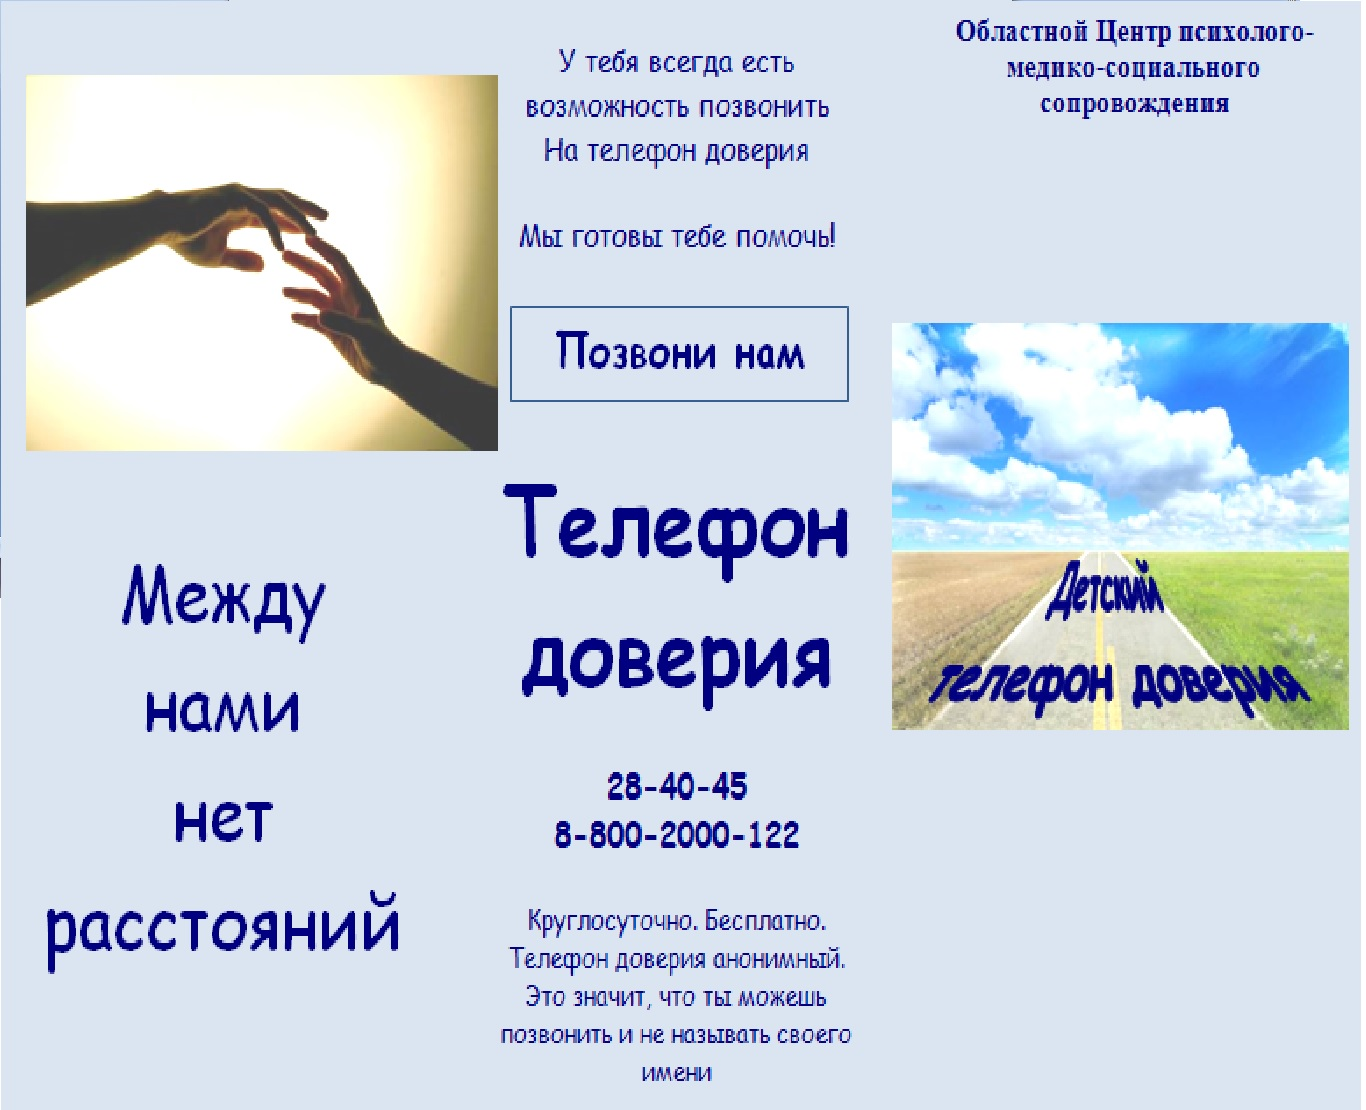 http://borki-terbuny2.ucoz.net/telefon_doverija.jpg